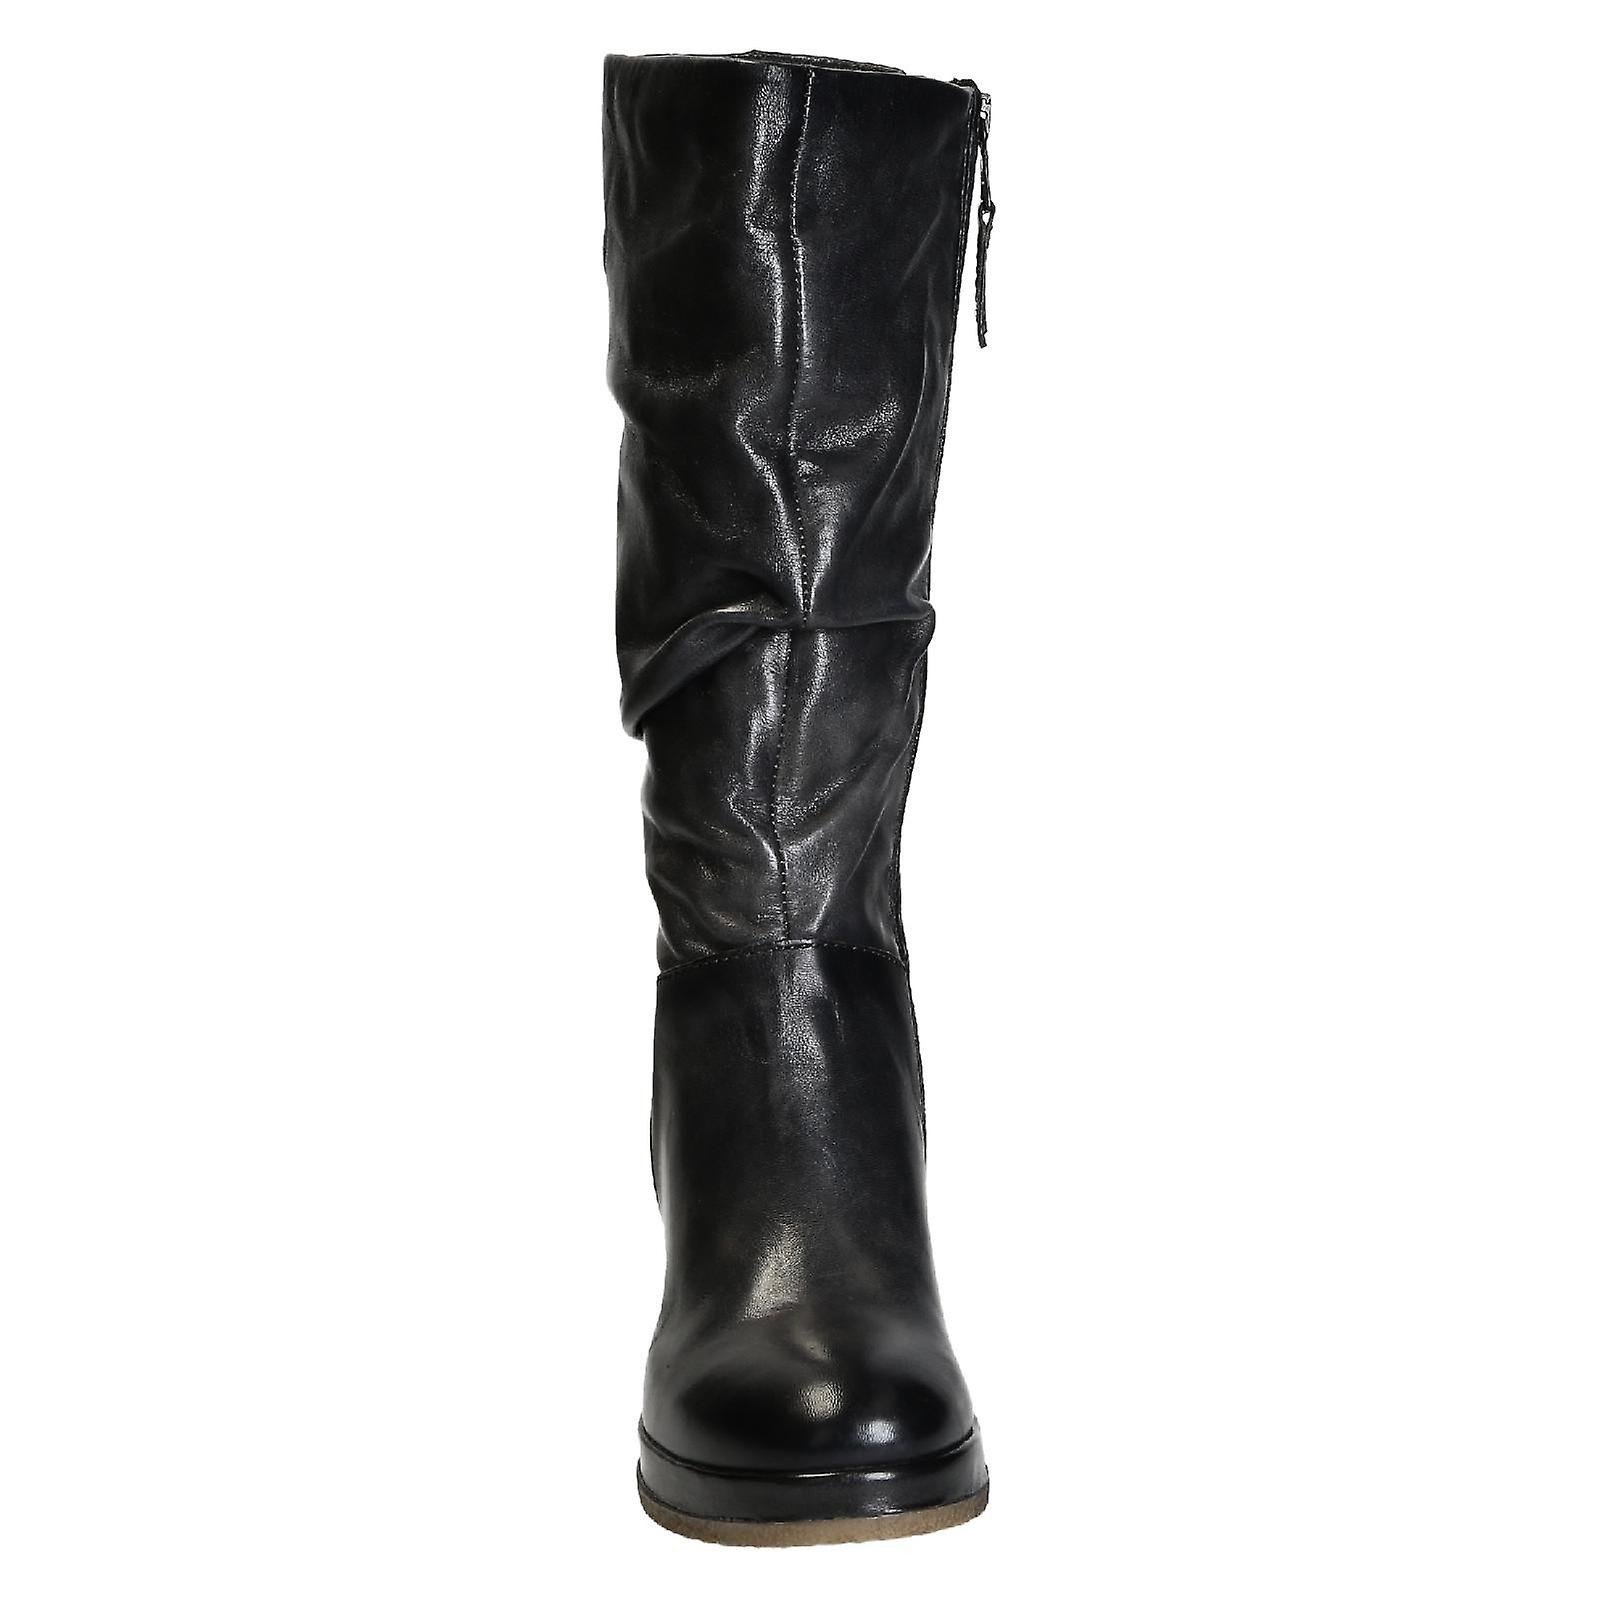 Handmade women's boots in dark grey shiny calf leather